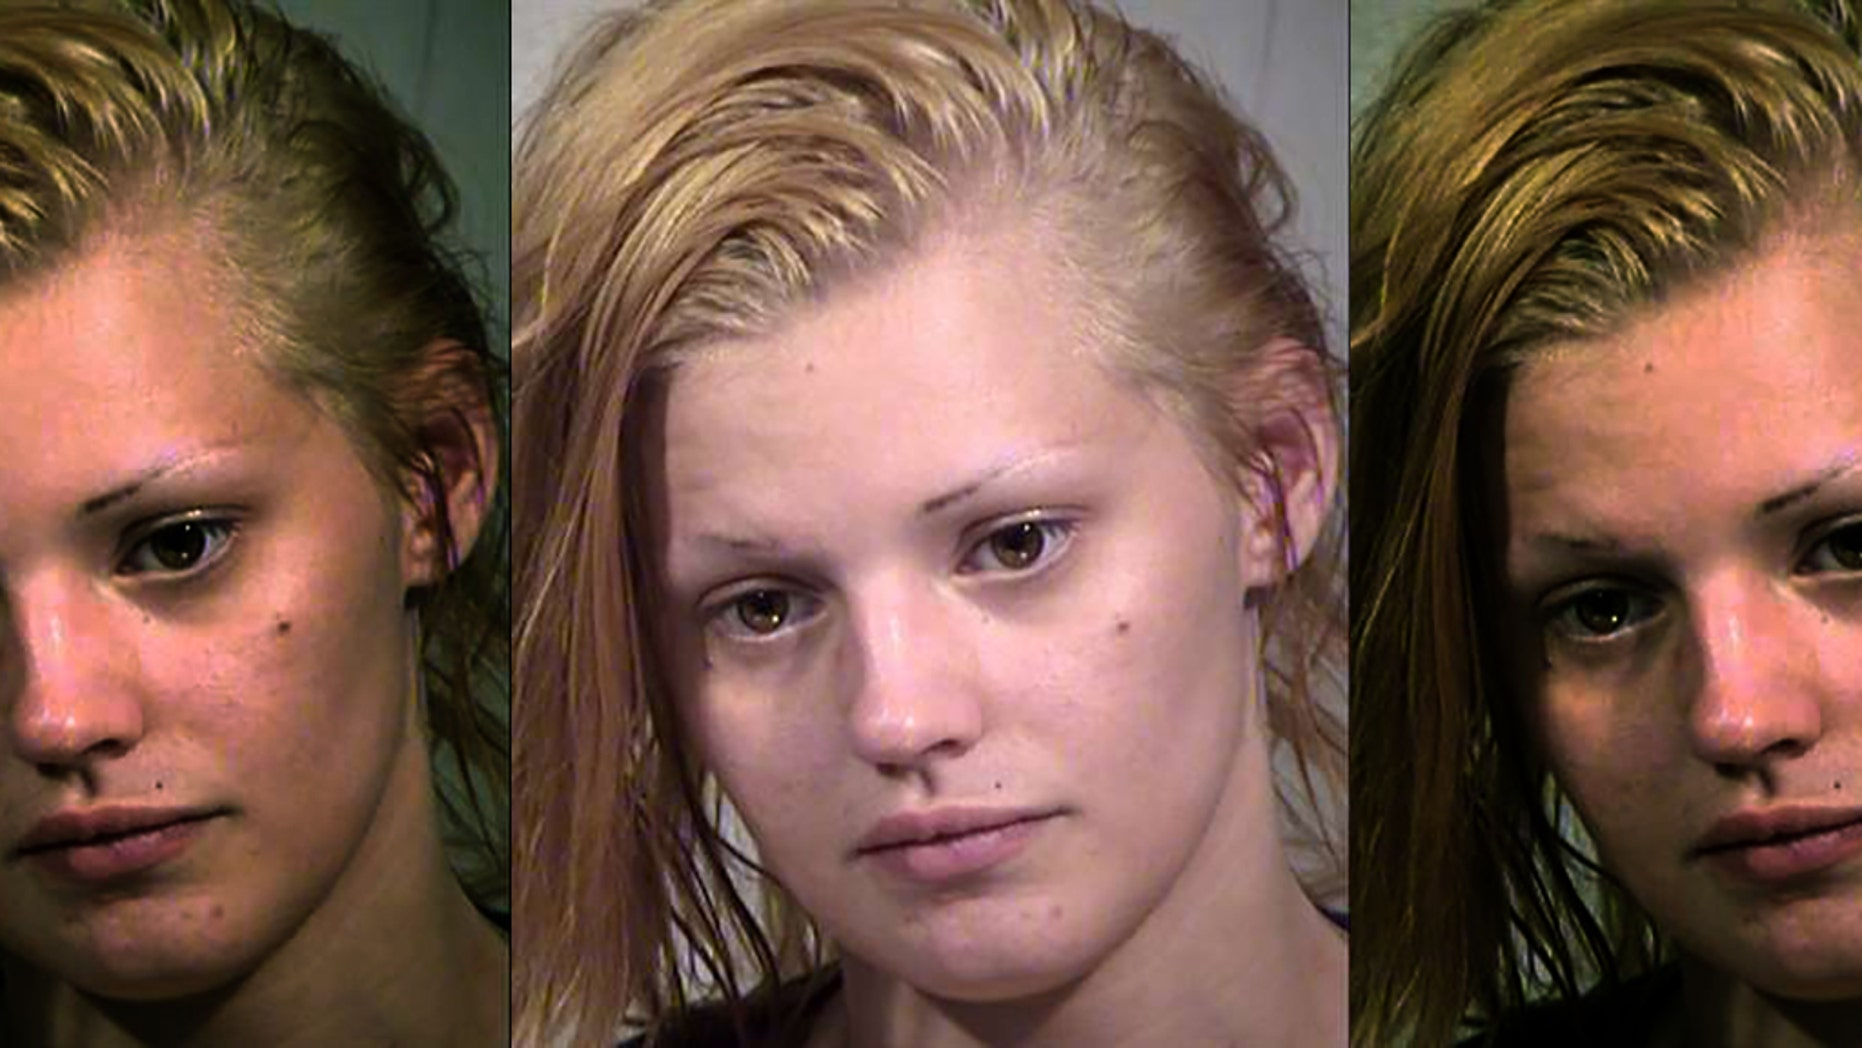 This undated undated Clark County Detention Center booking photo shows Krystal Whipple, 21, of Las Vegas. (Las Vegas Metropolitan Police Department)